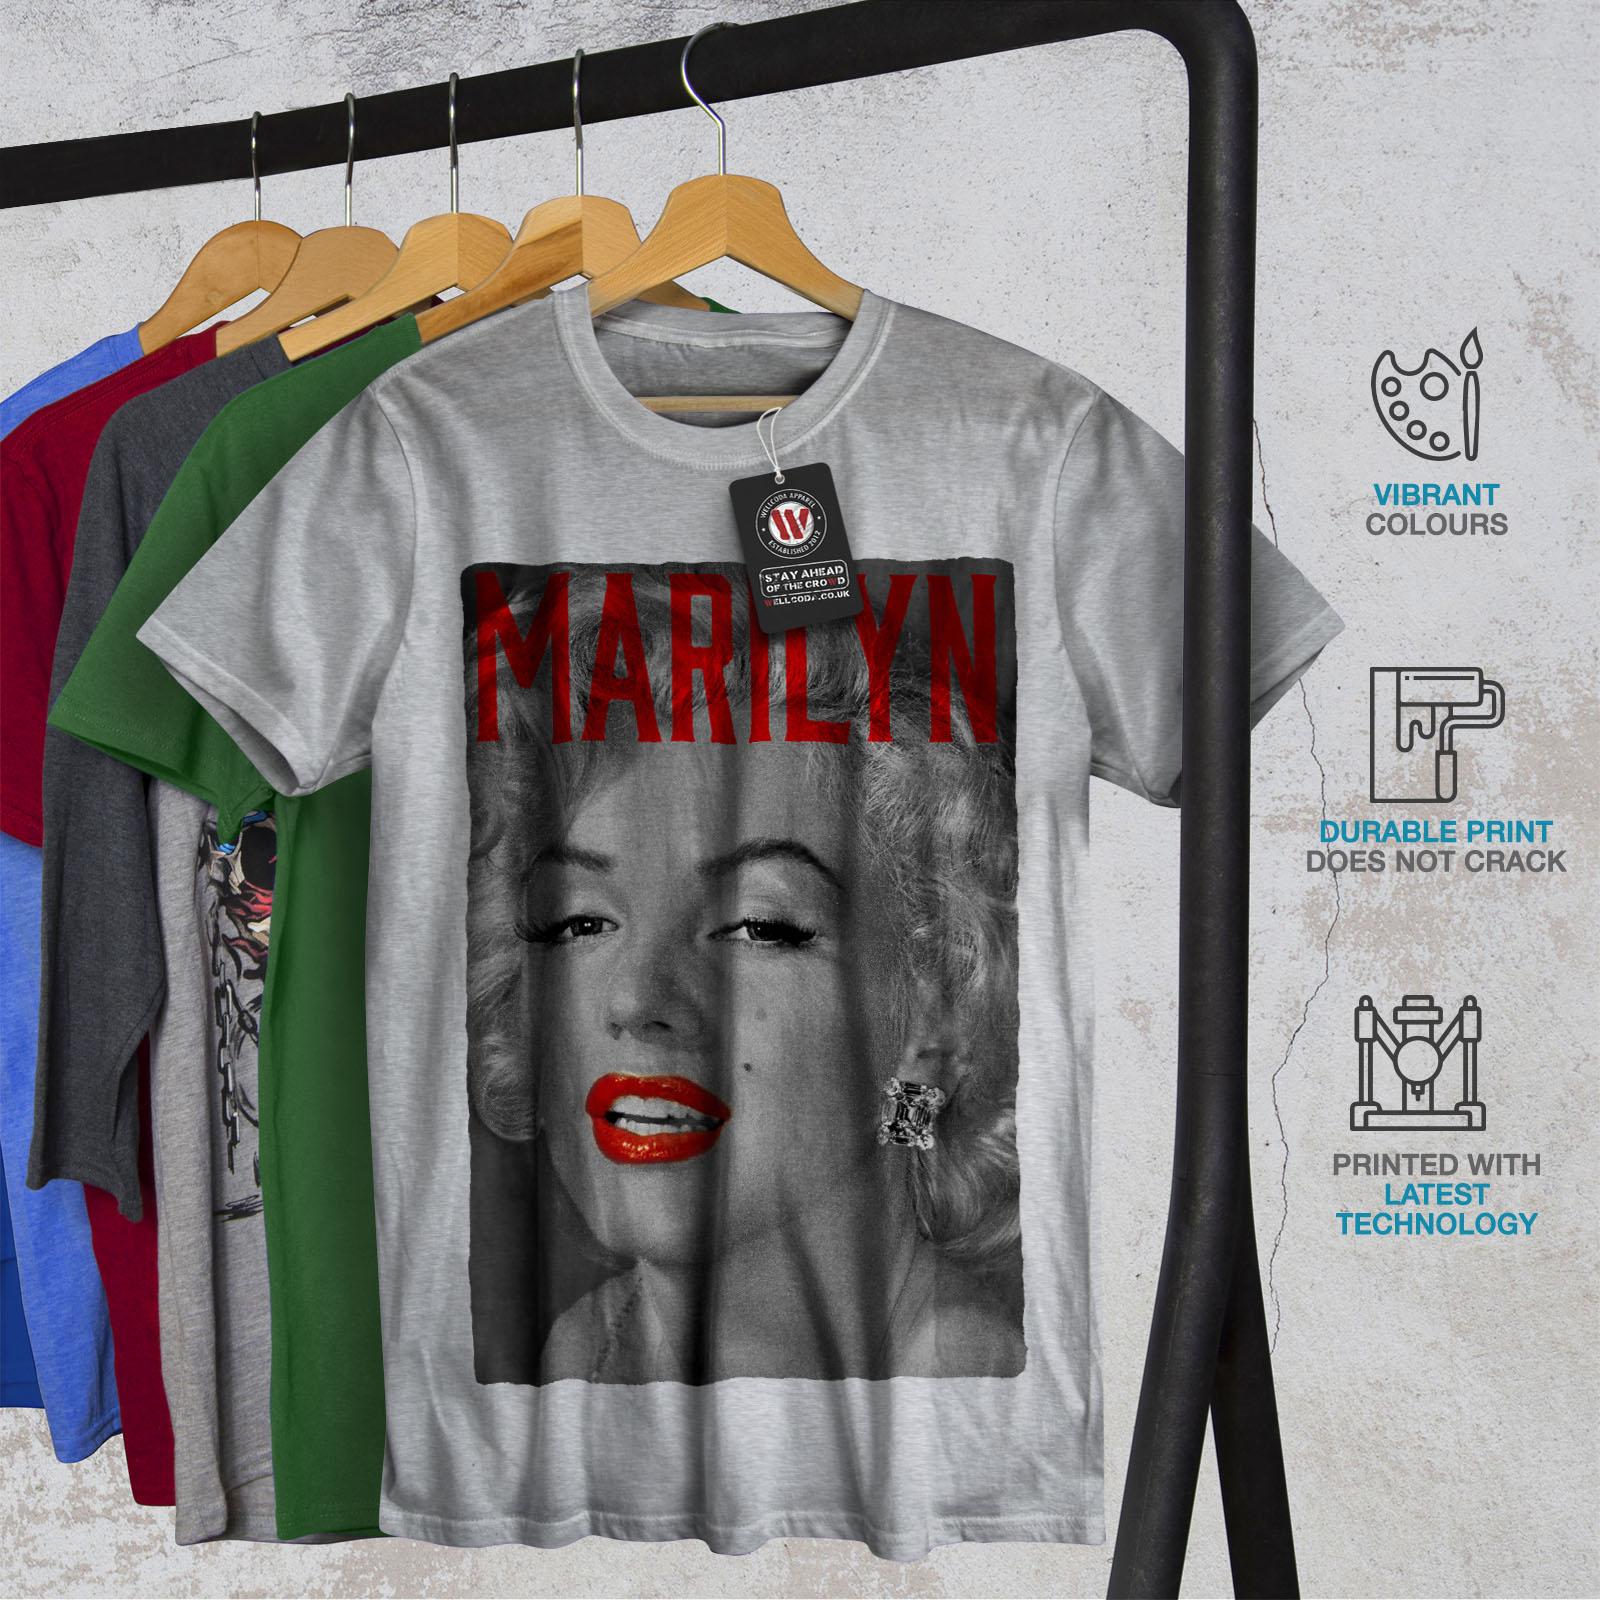 Wellcoda-Marilyn-Retro-Photo-Mens-T-shirt-Urban-Graphic-Design-Printed-Tee thumbnail 18